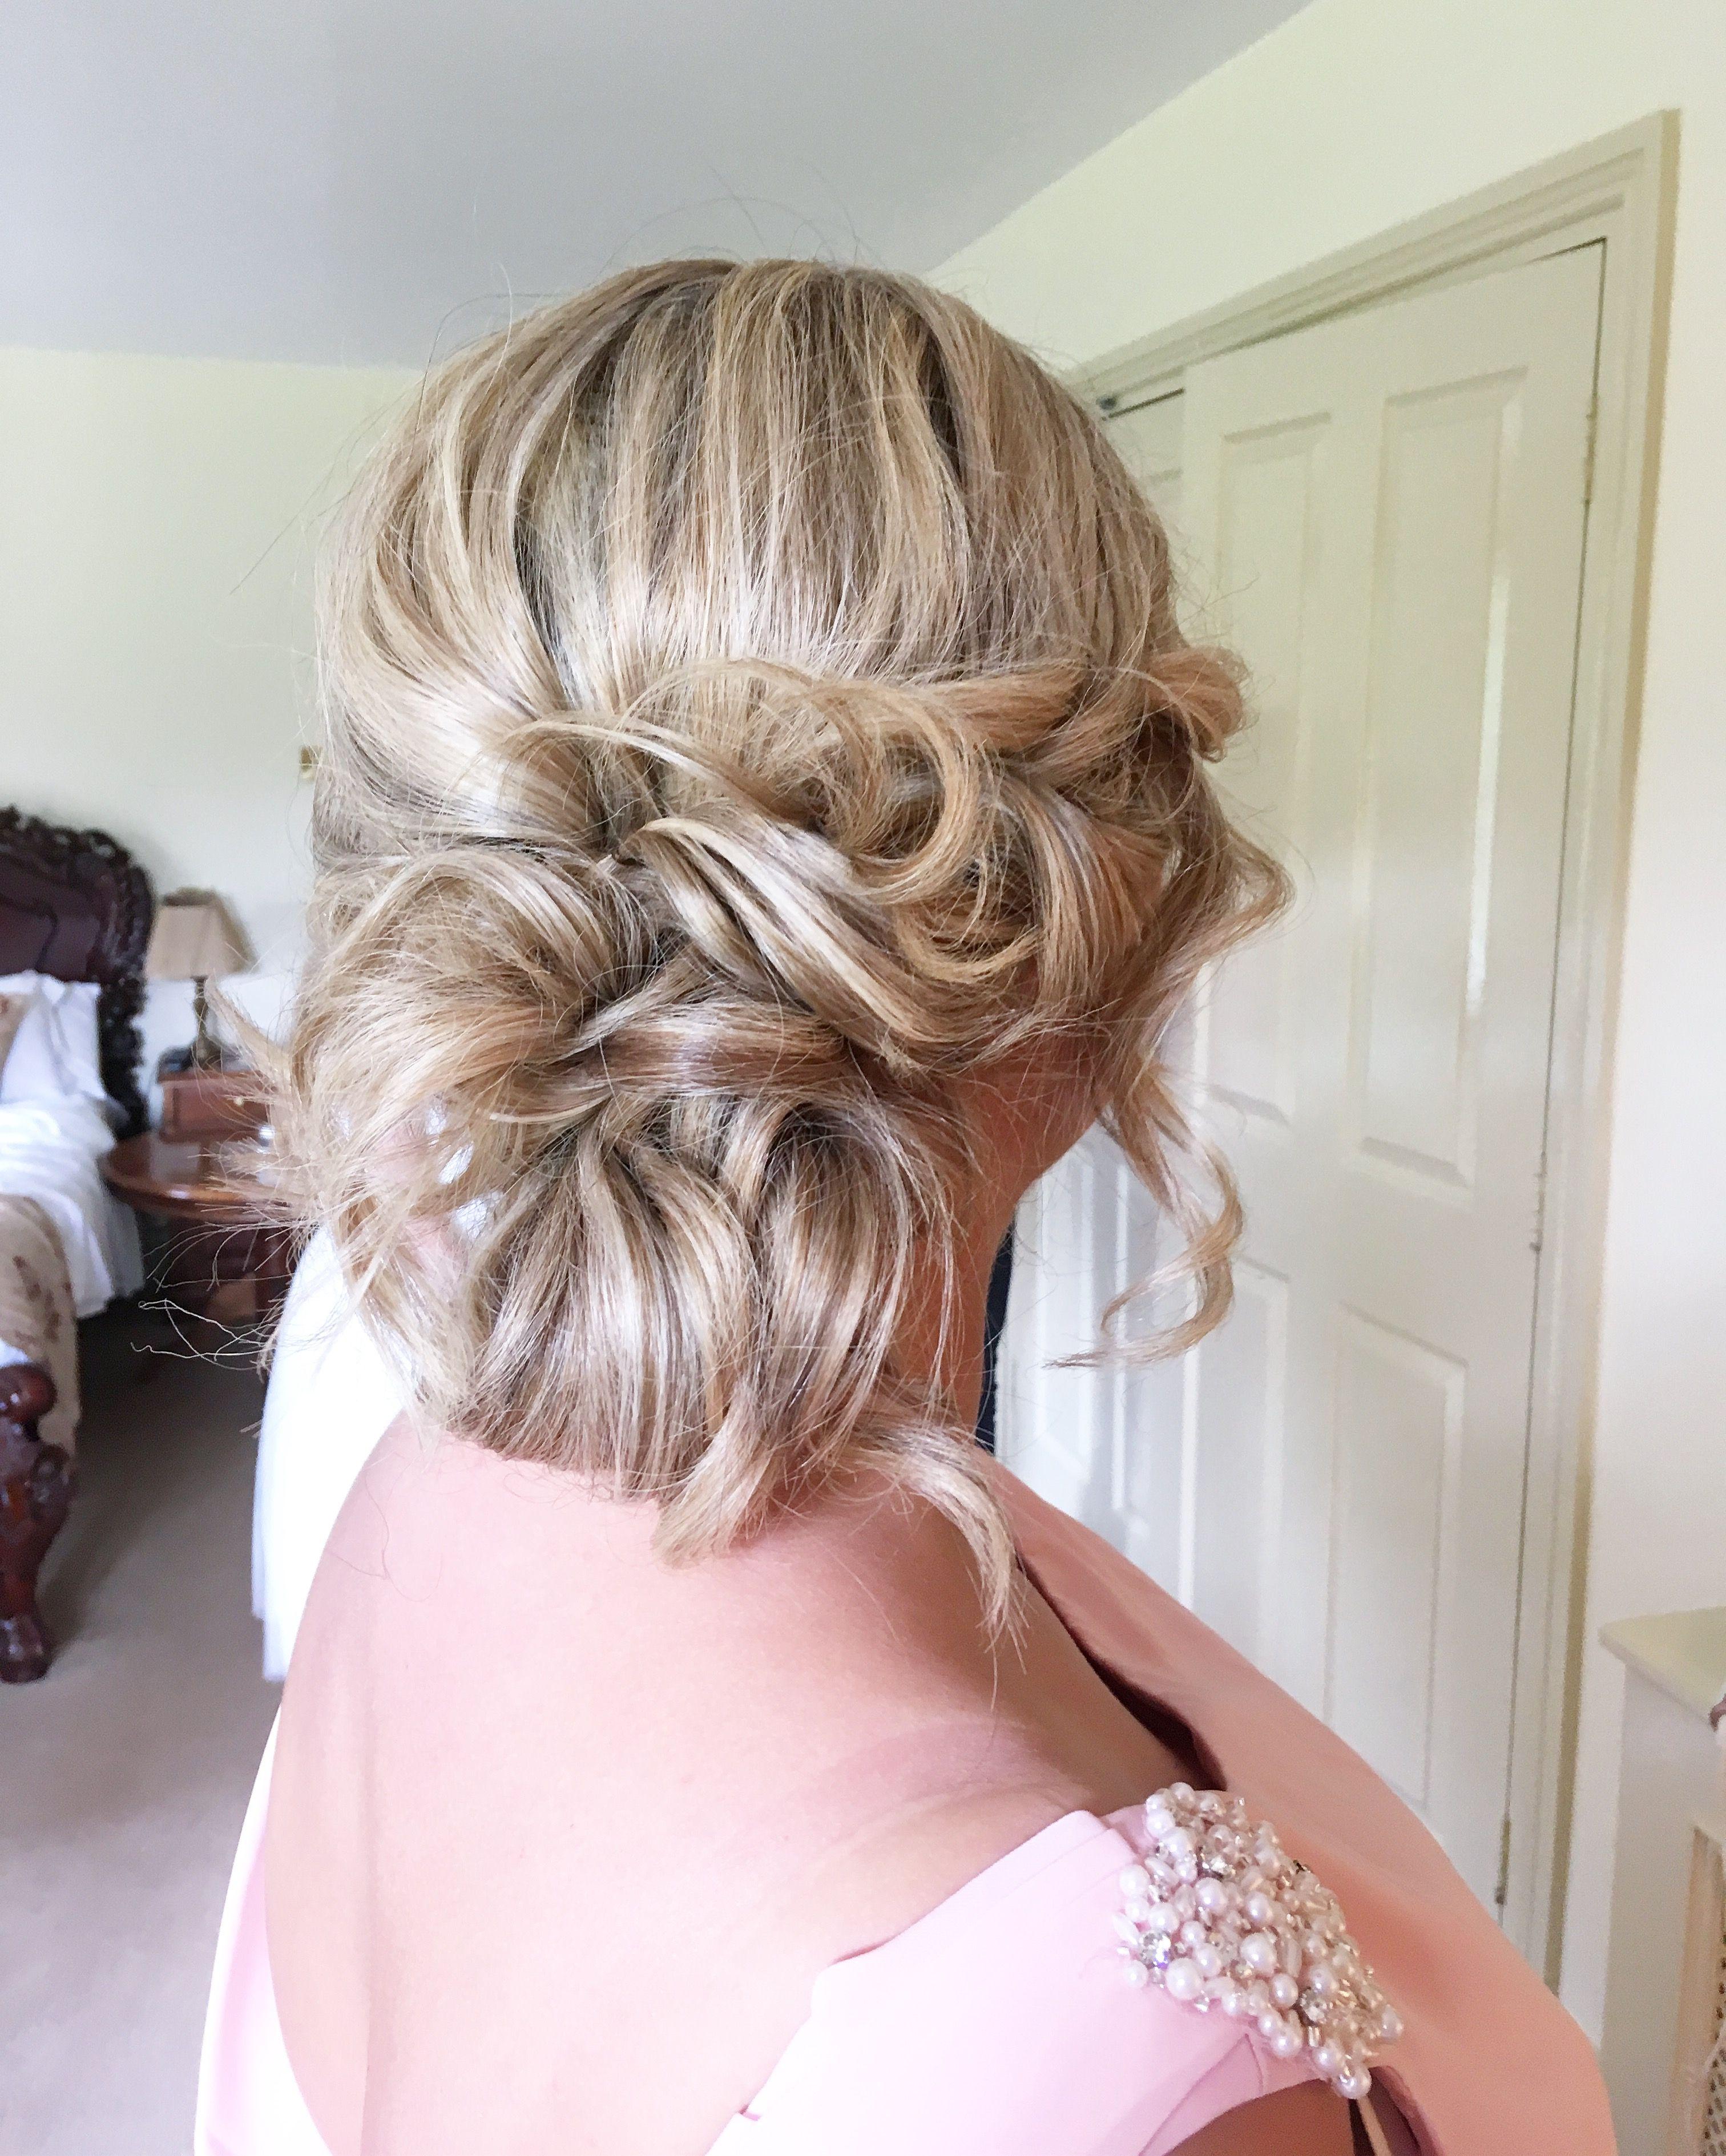 Wedding updo ✄ my Hair Styles ✄ Pinterest